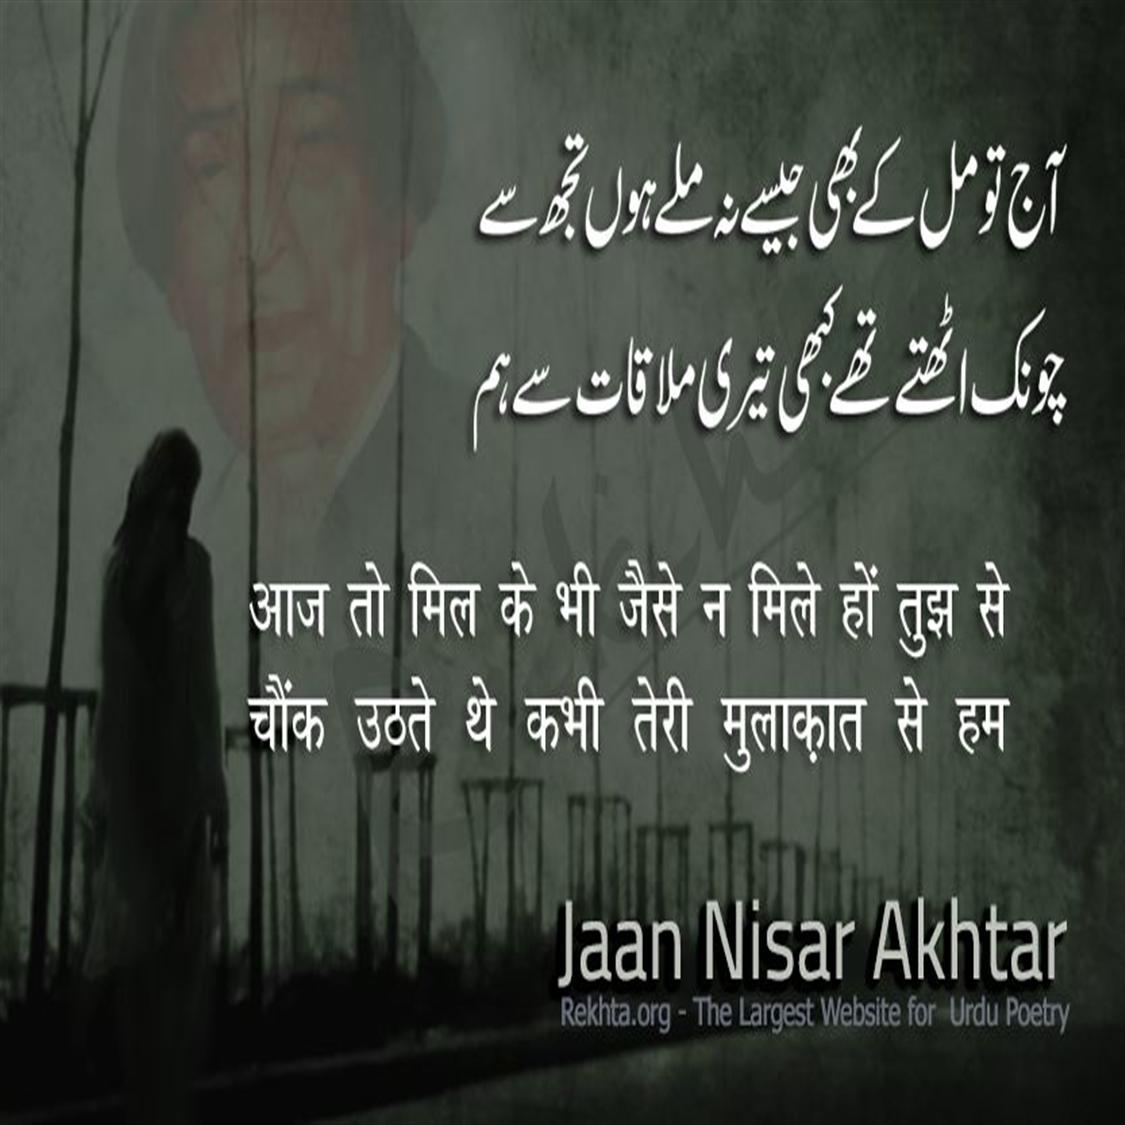 aaj to mil ke bhii jaise na mile ho.n tujh se-Jaan Nisar Akhtar